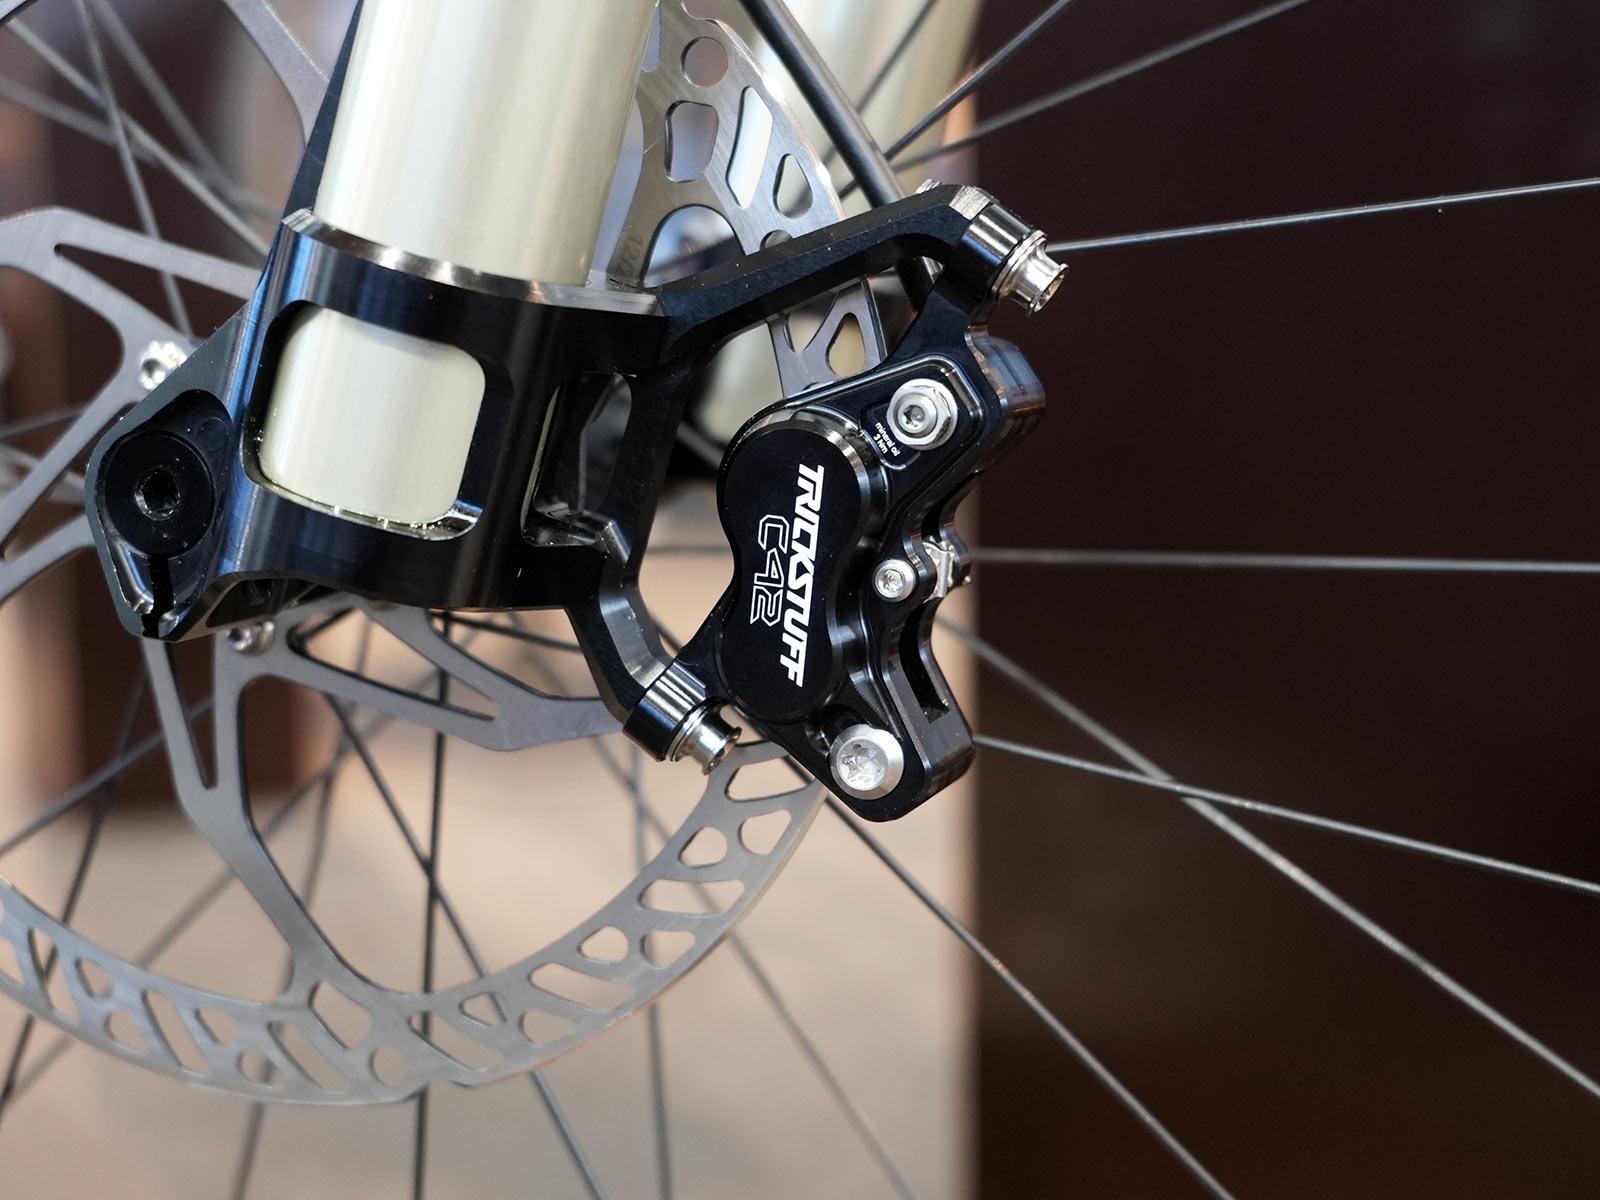 trickstuff c42 4-piston disc brake calipers for mountain bikes